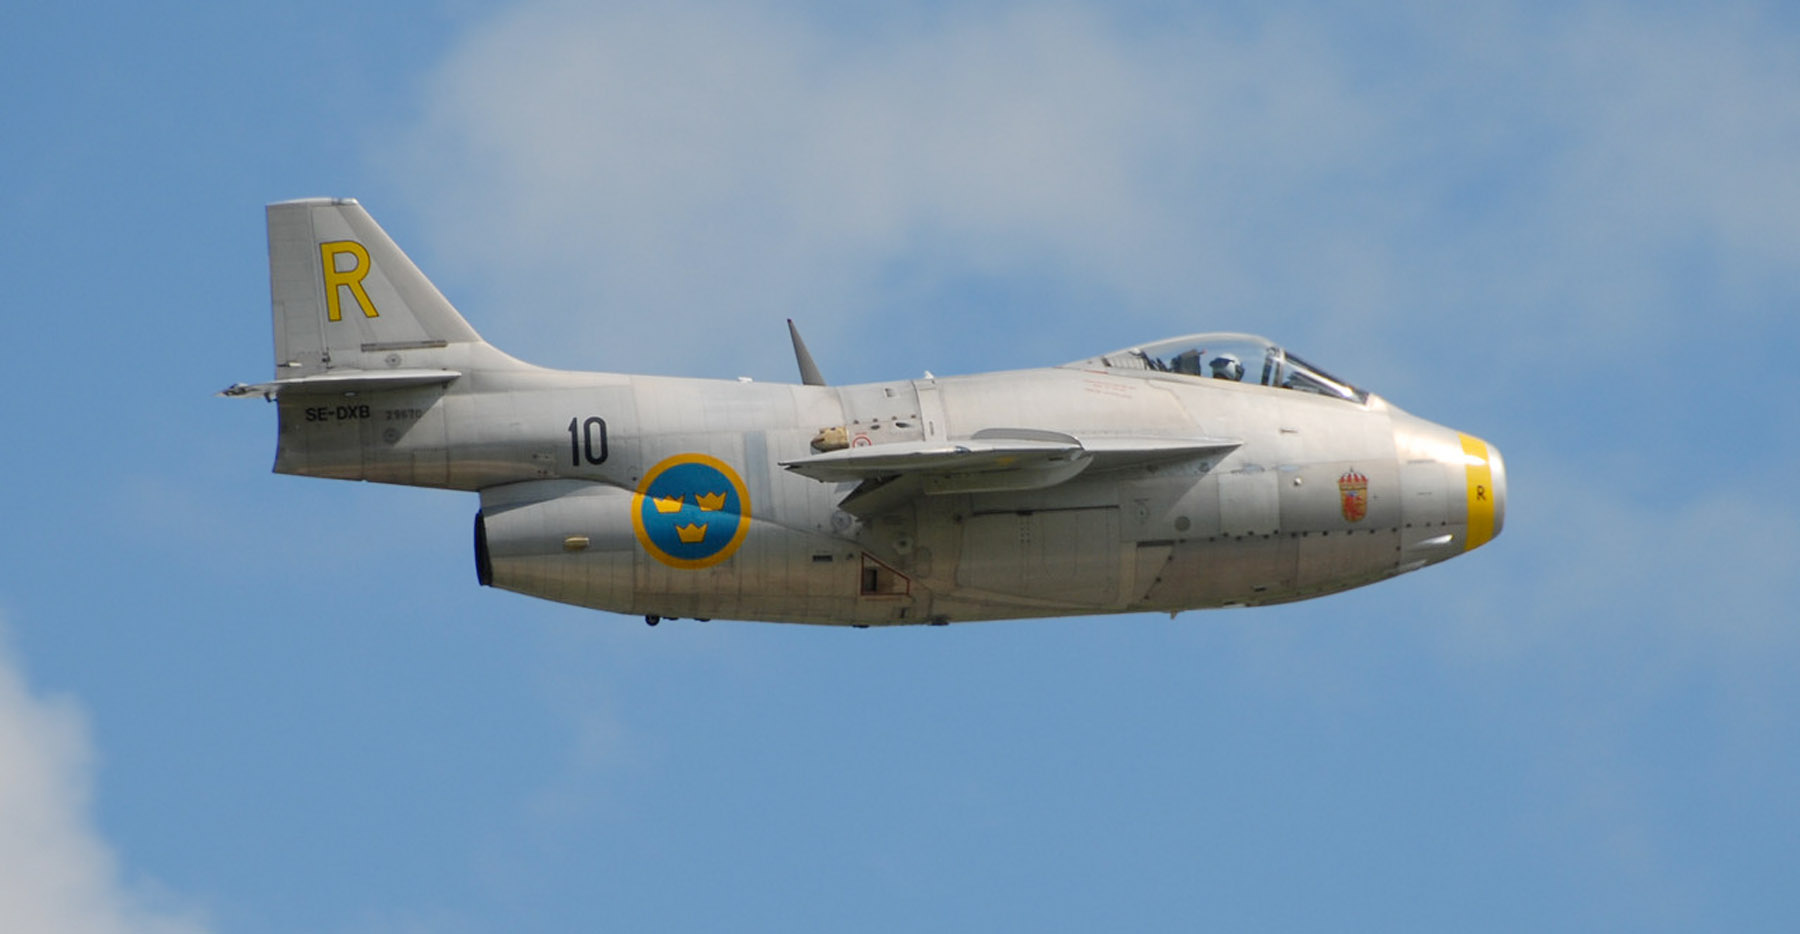 http://fly.historicwings.com/wp-content/uploads/2012/10/HighFlight-Draken3.jpg